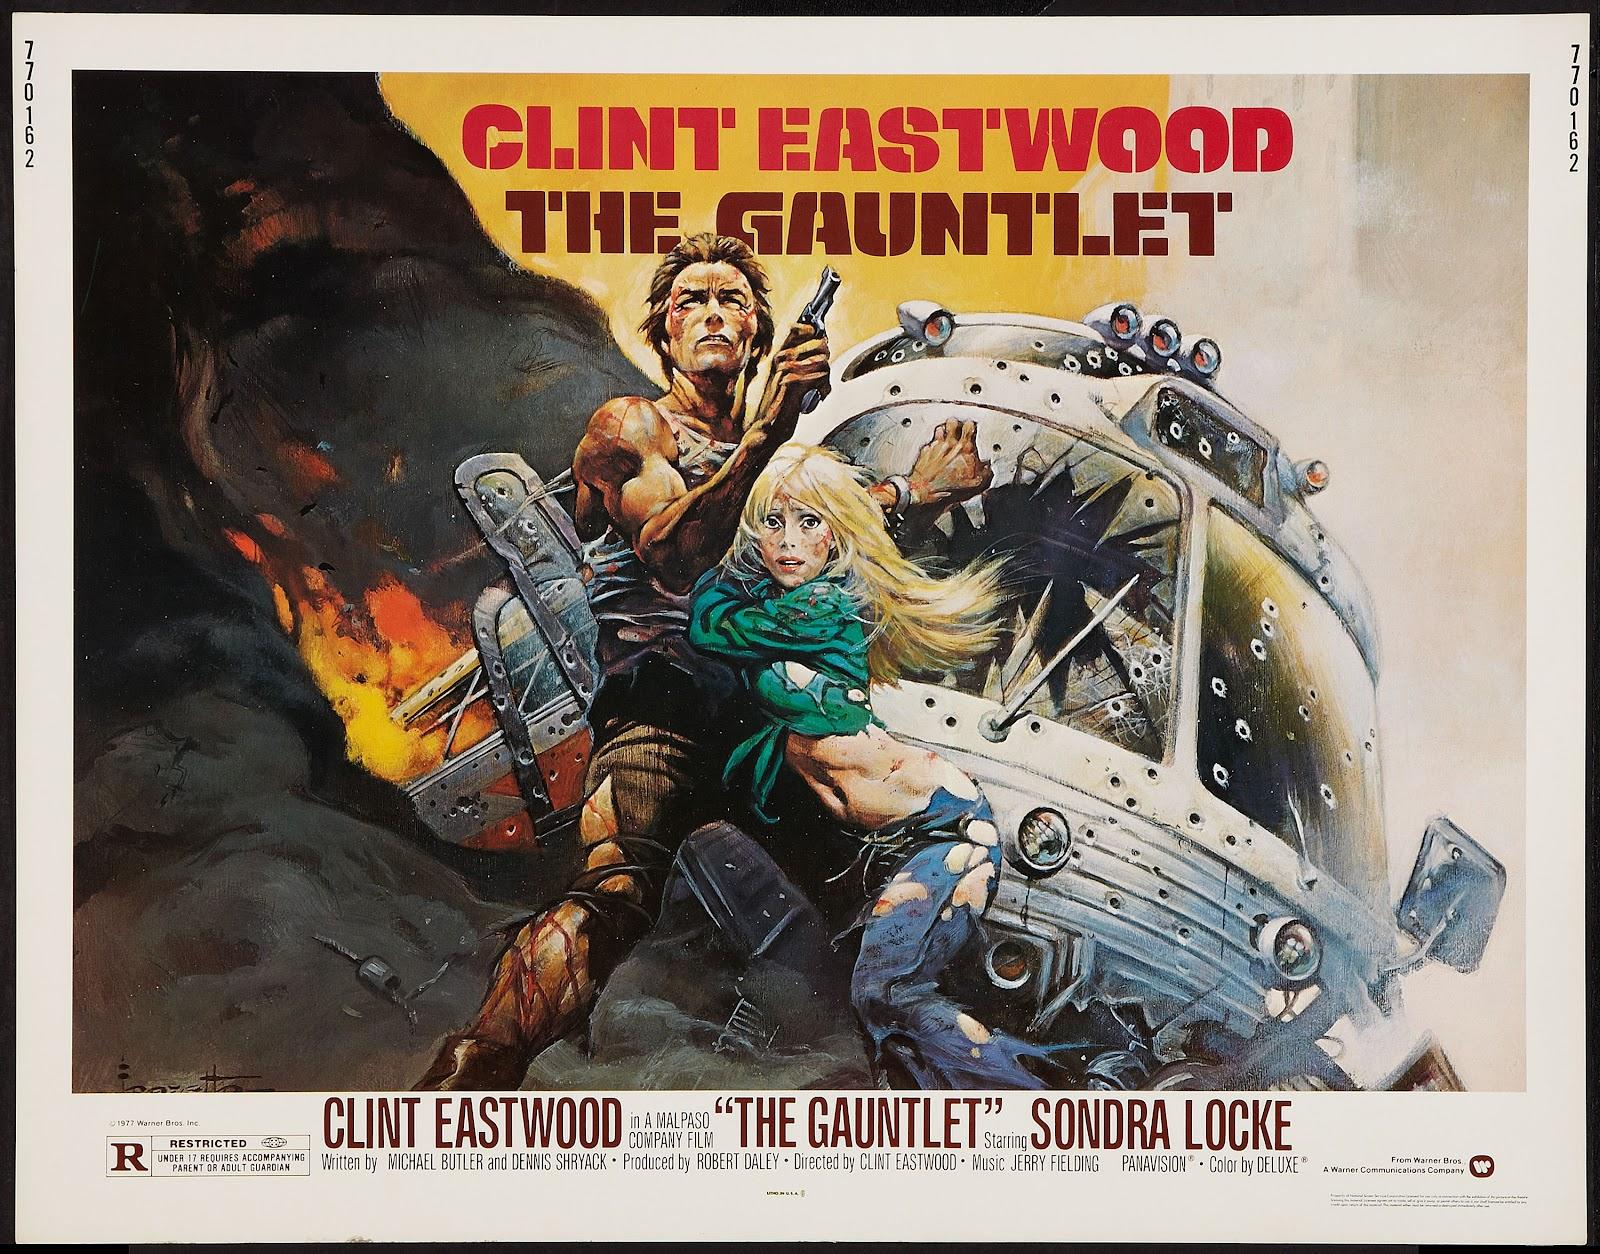 capns comics the gauntlet by frank frazetta and clint